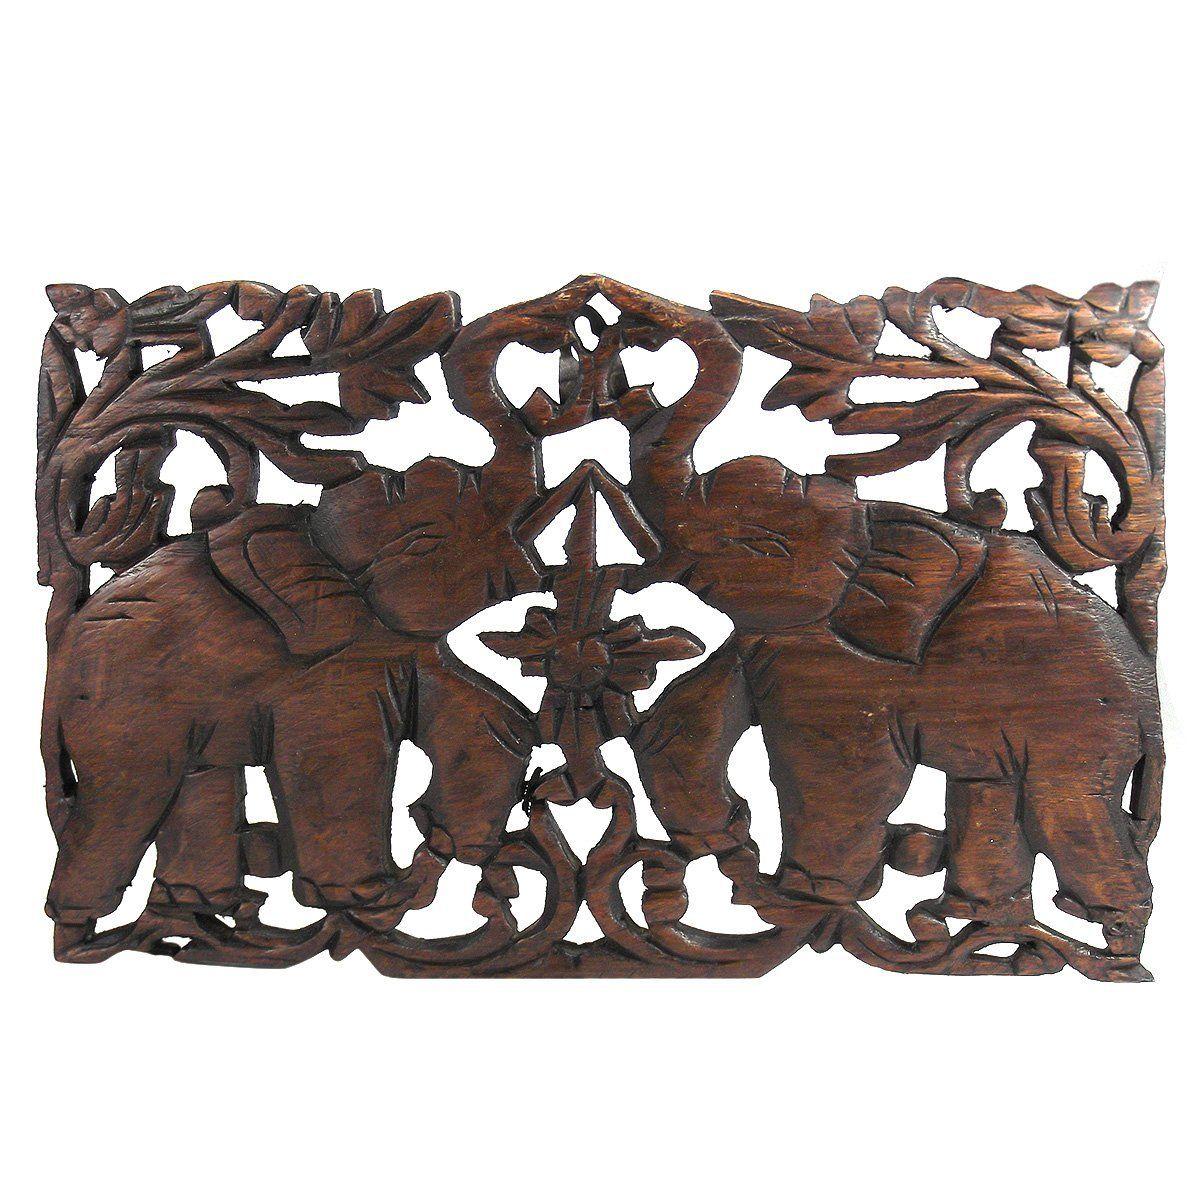 Jubilant thai elephant duo hand carved teak wood wall art relief